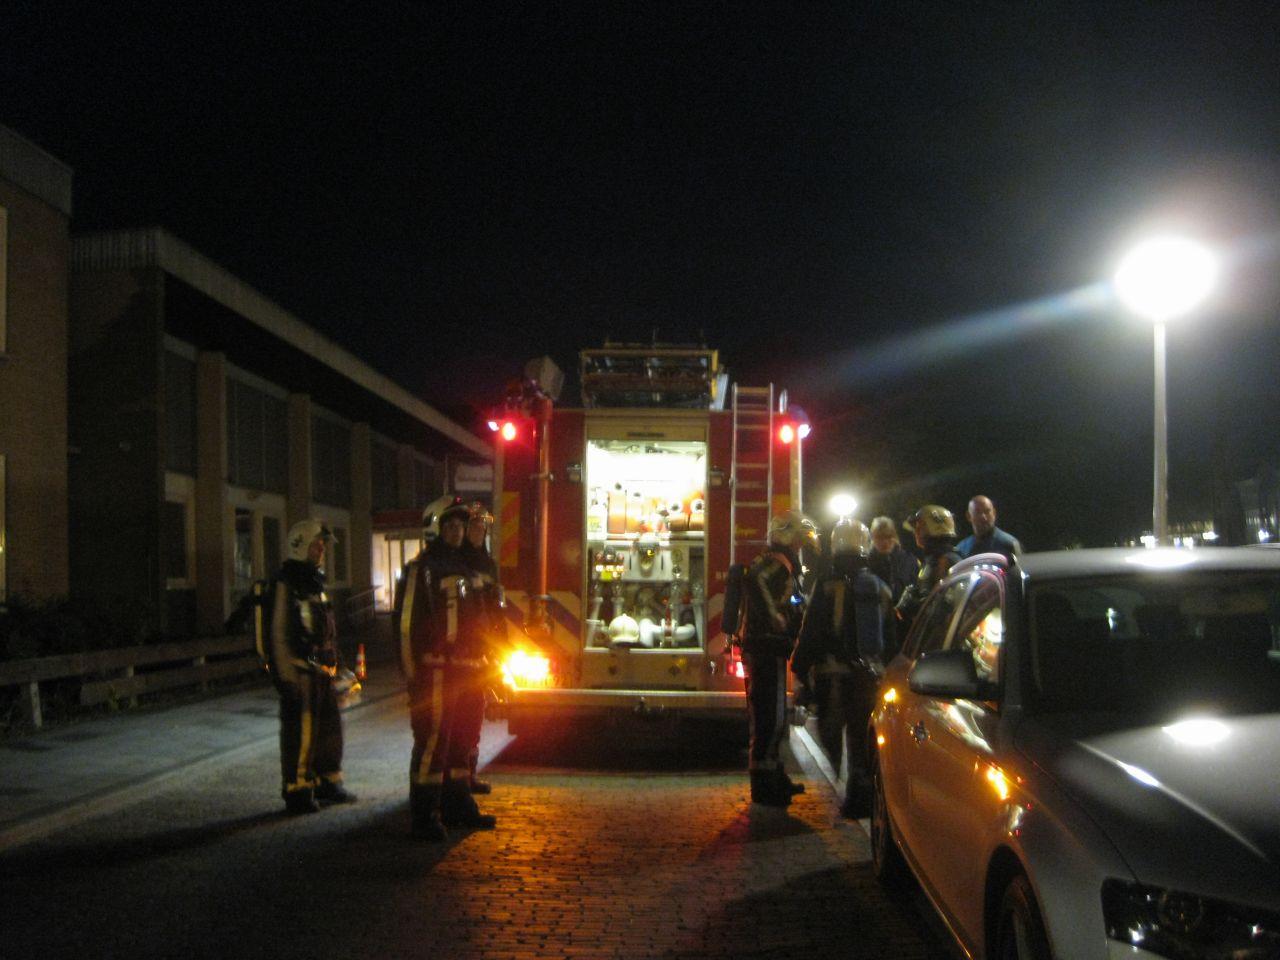 Stofzuiger veroorzaakt brandlucht